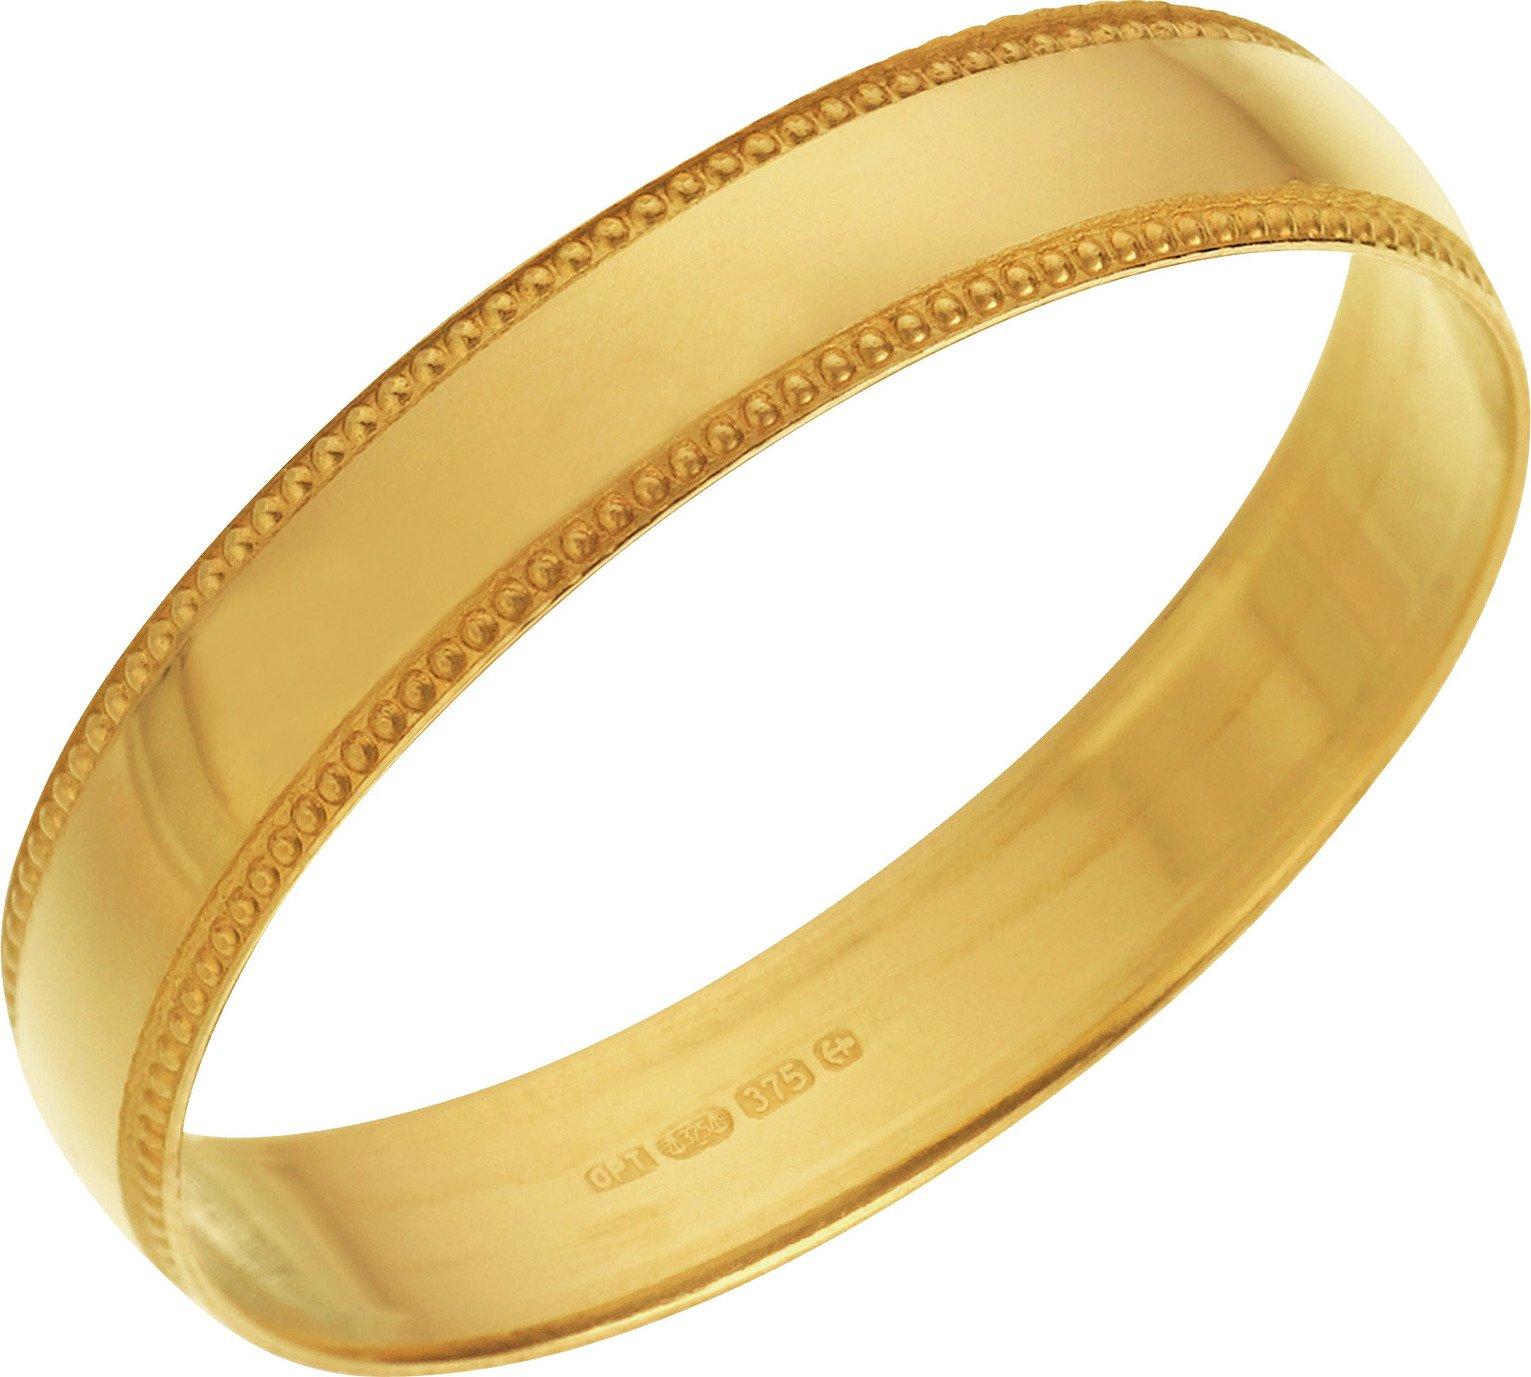 Revere 9ct Yellow Gold Plain Milgrain Wedding Ring - 4mm